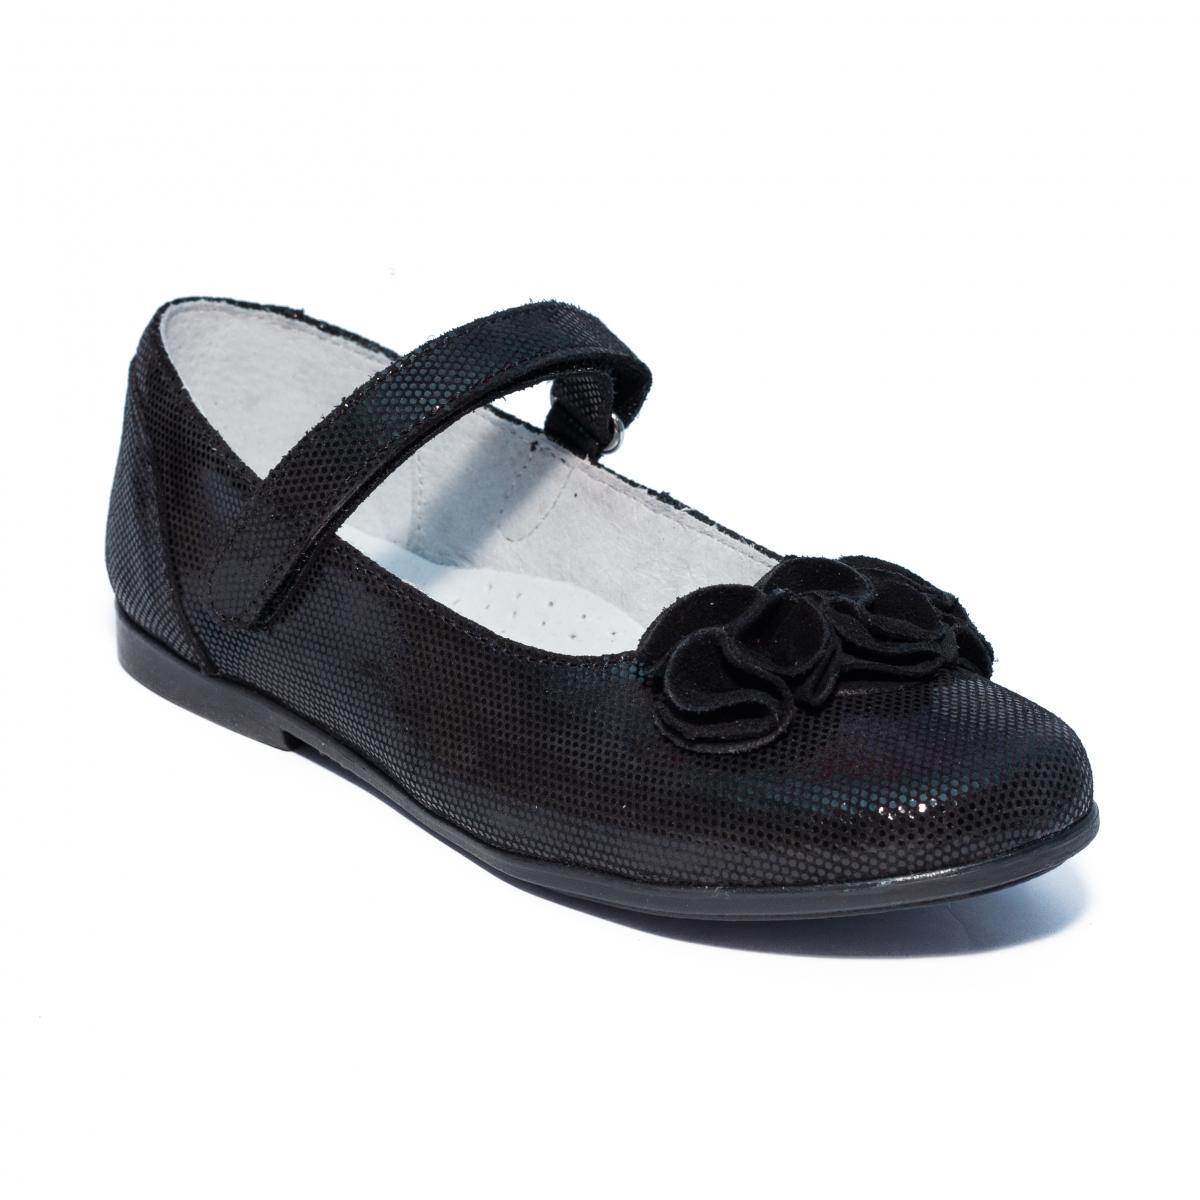 Pantofi balerini hokide 272 negru lux folare 26-35